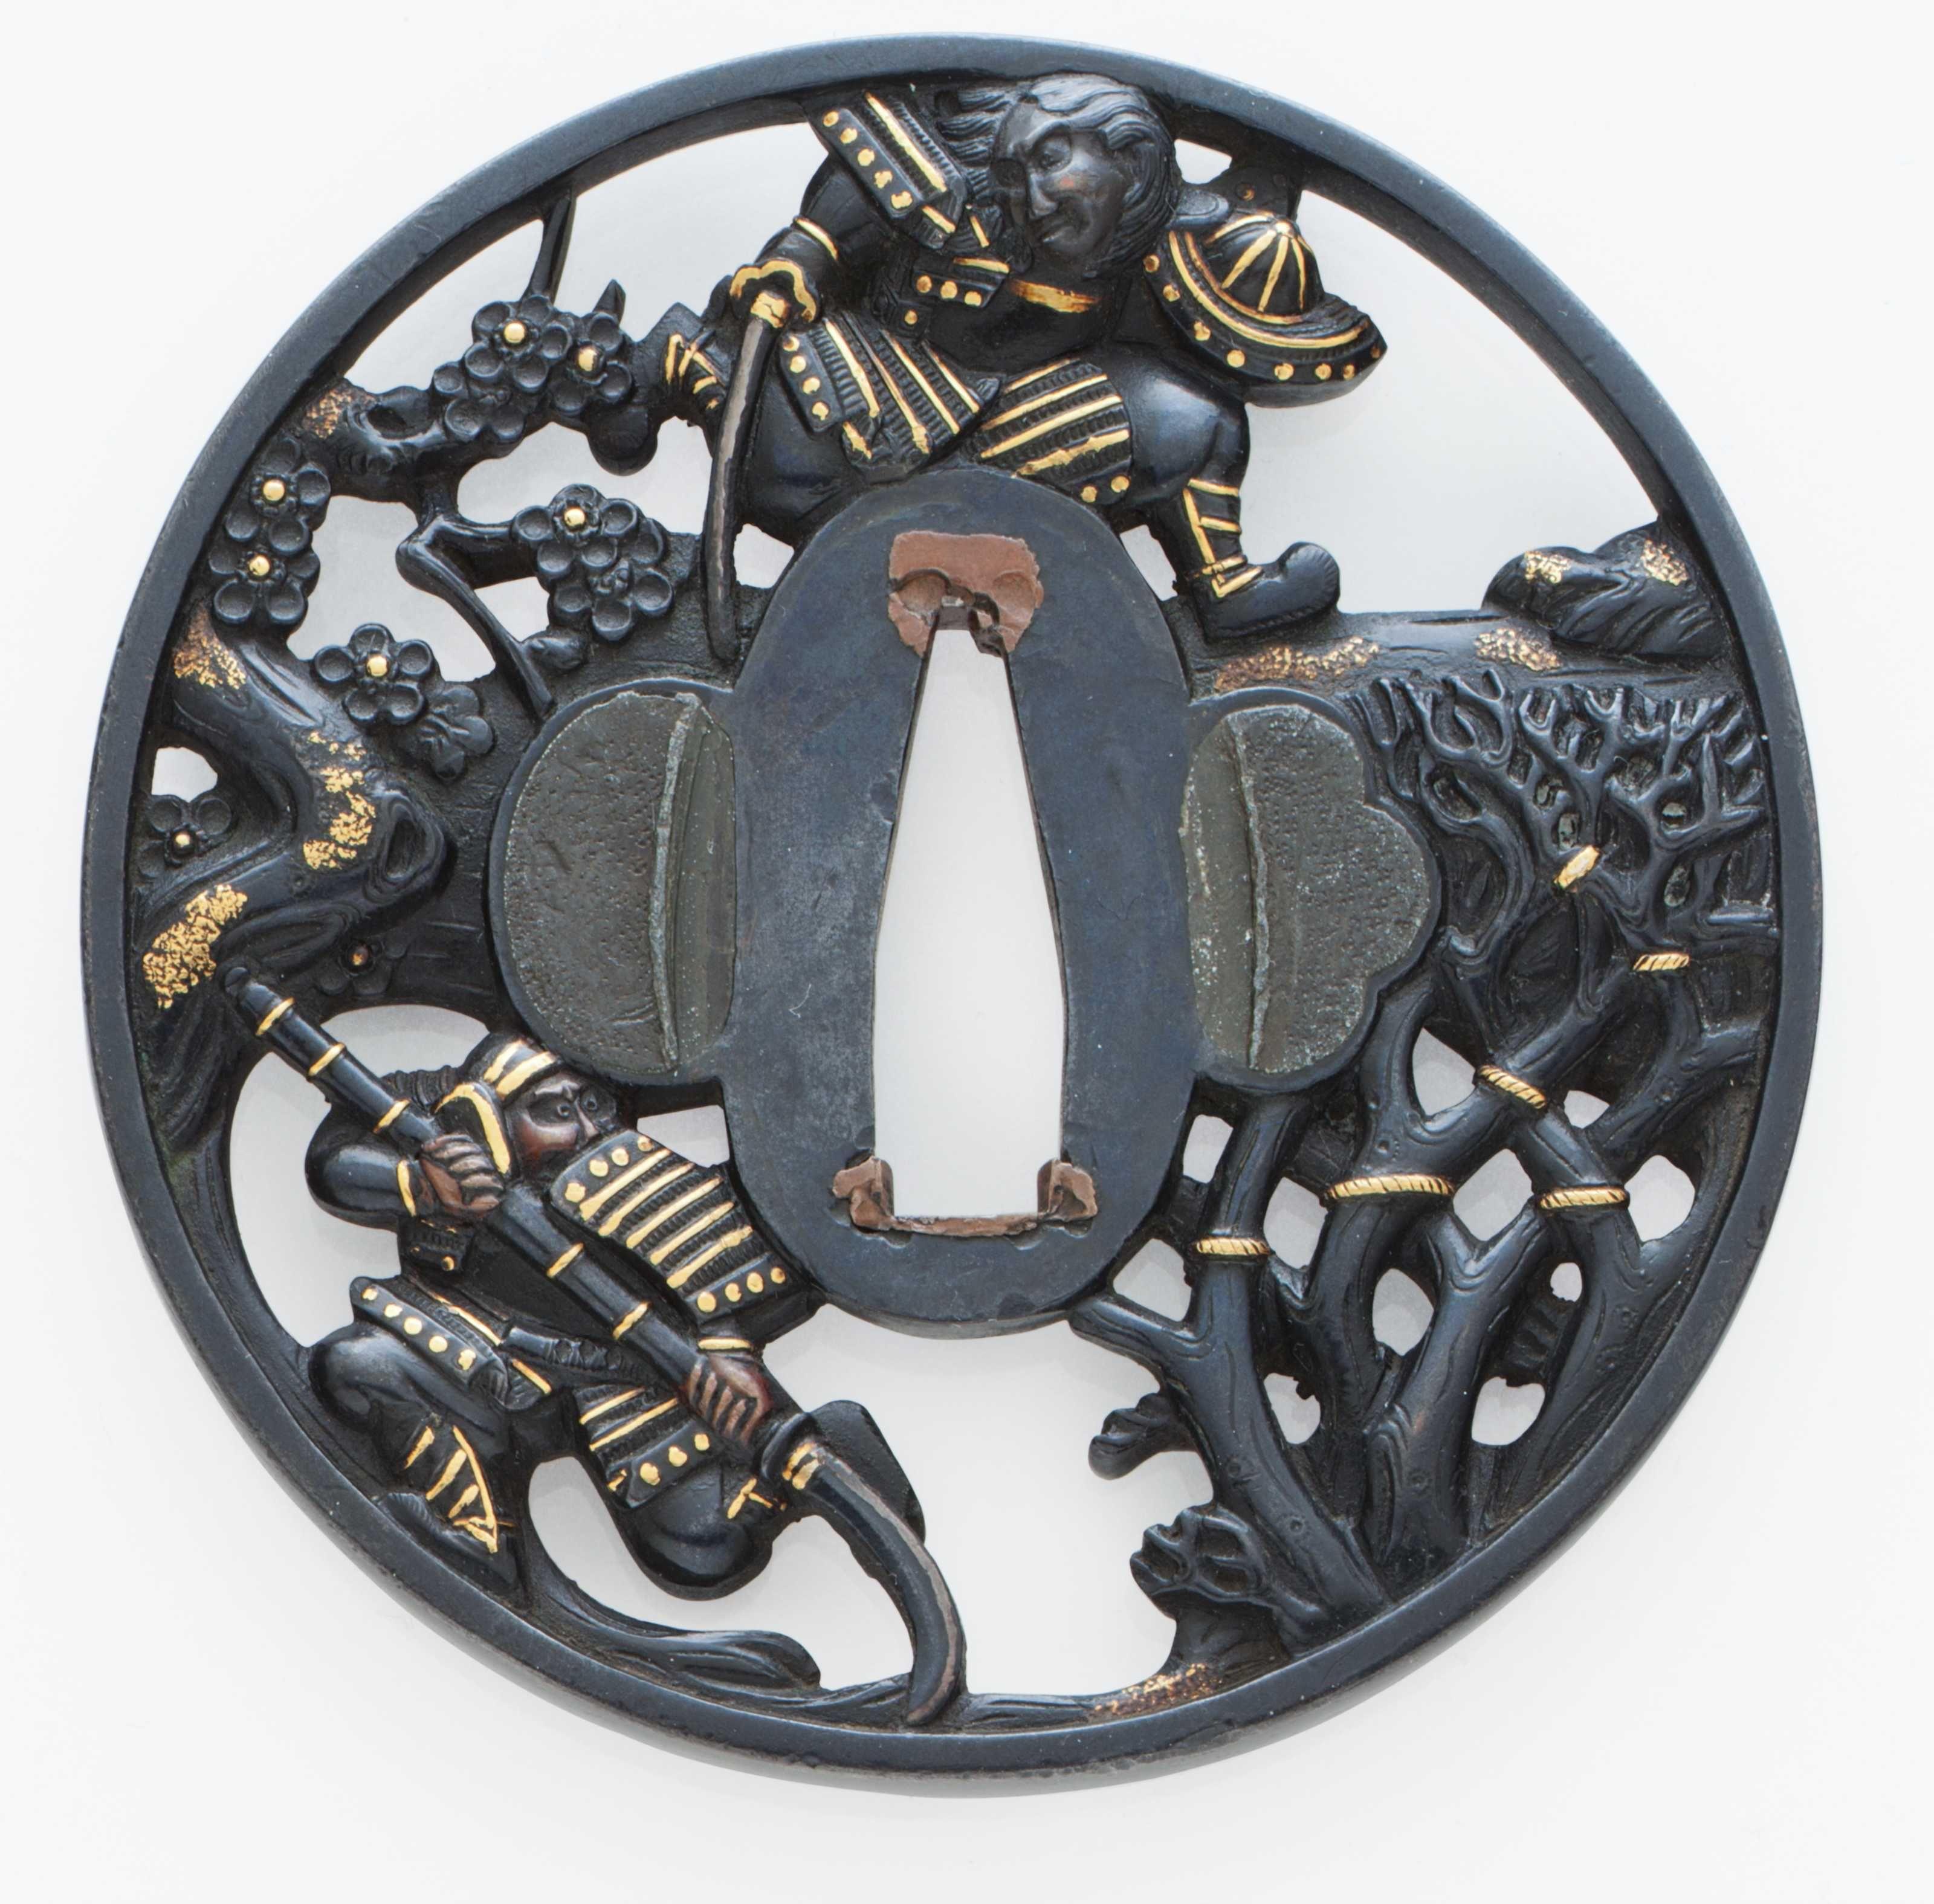 A Soten-style shakudo tsuba, Edo period (19th Century) https://pccdn.perfectchannel.com/christies/live/images/item/JapaneseSamurai3832/5851889/original/NYR_3832_0001.jpg